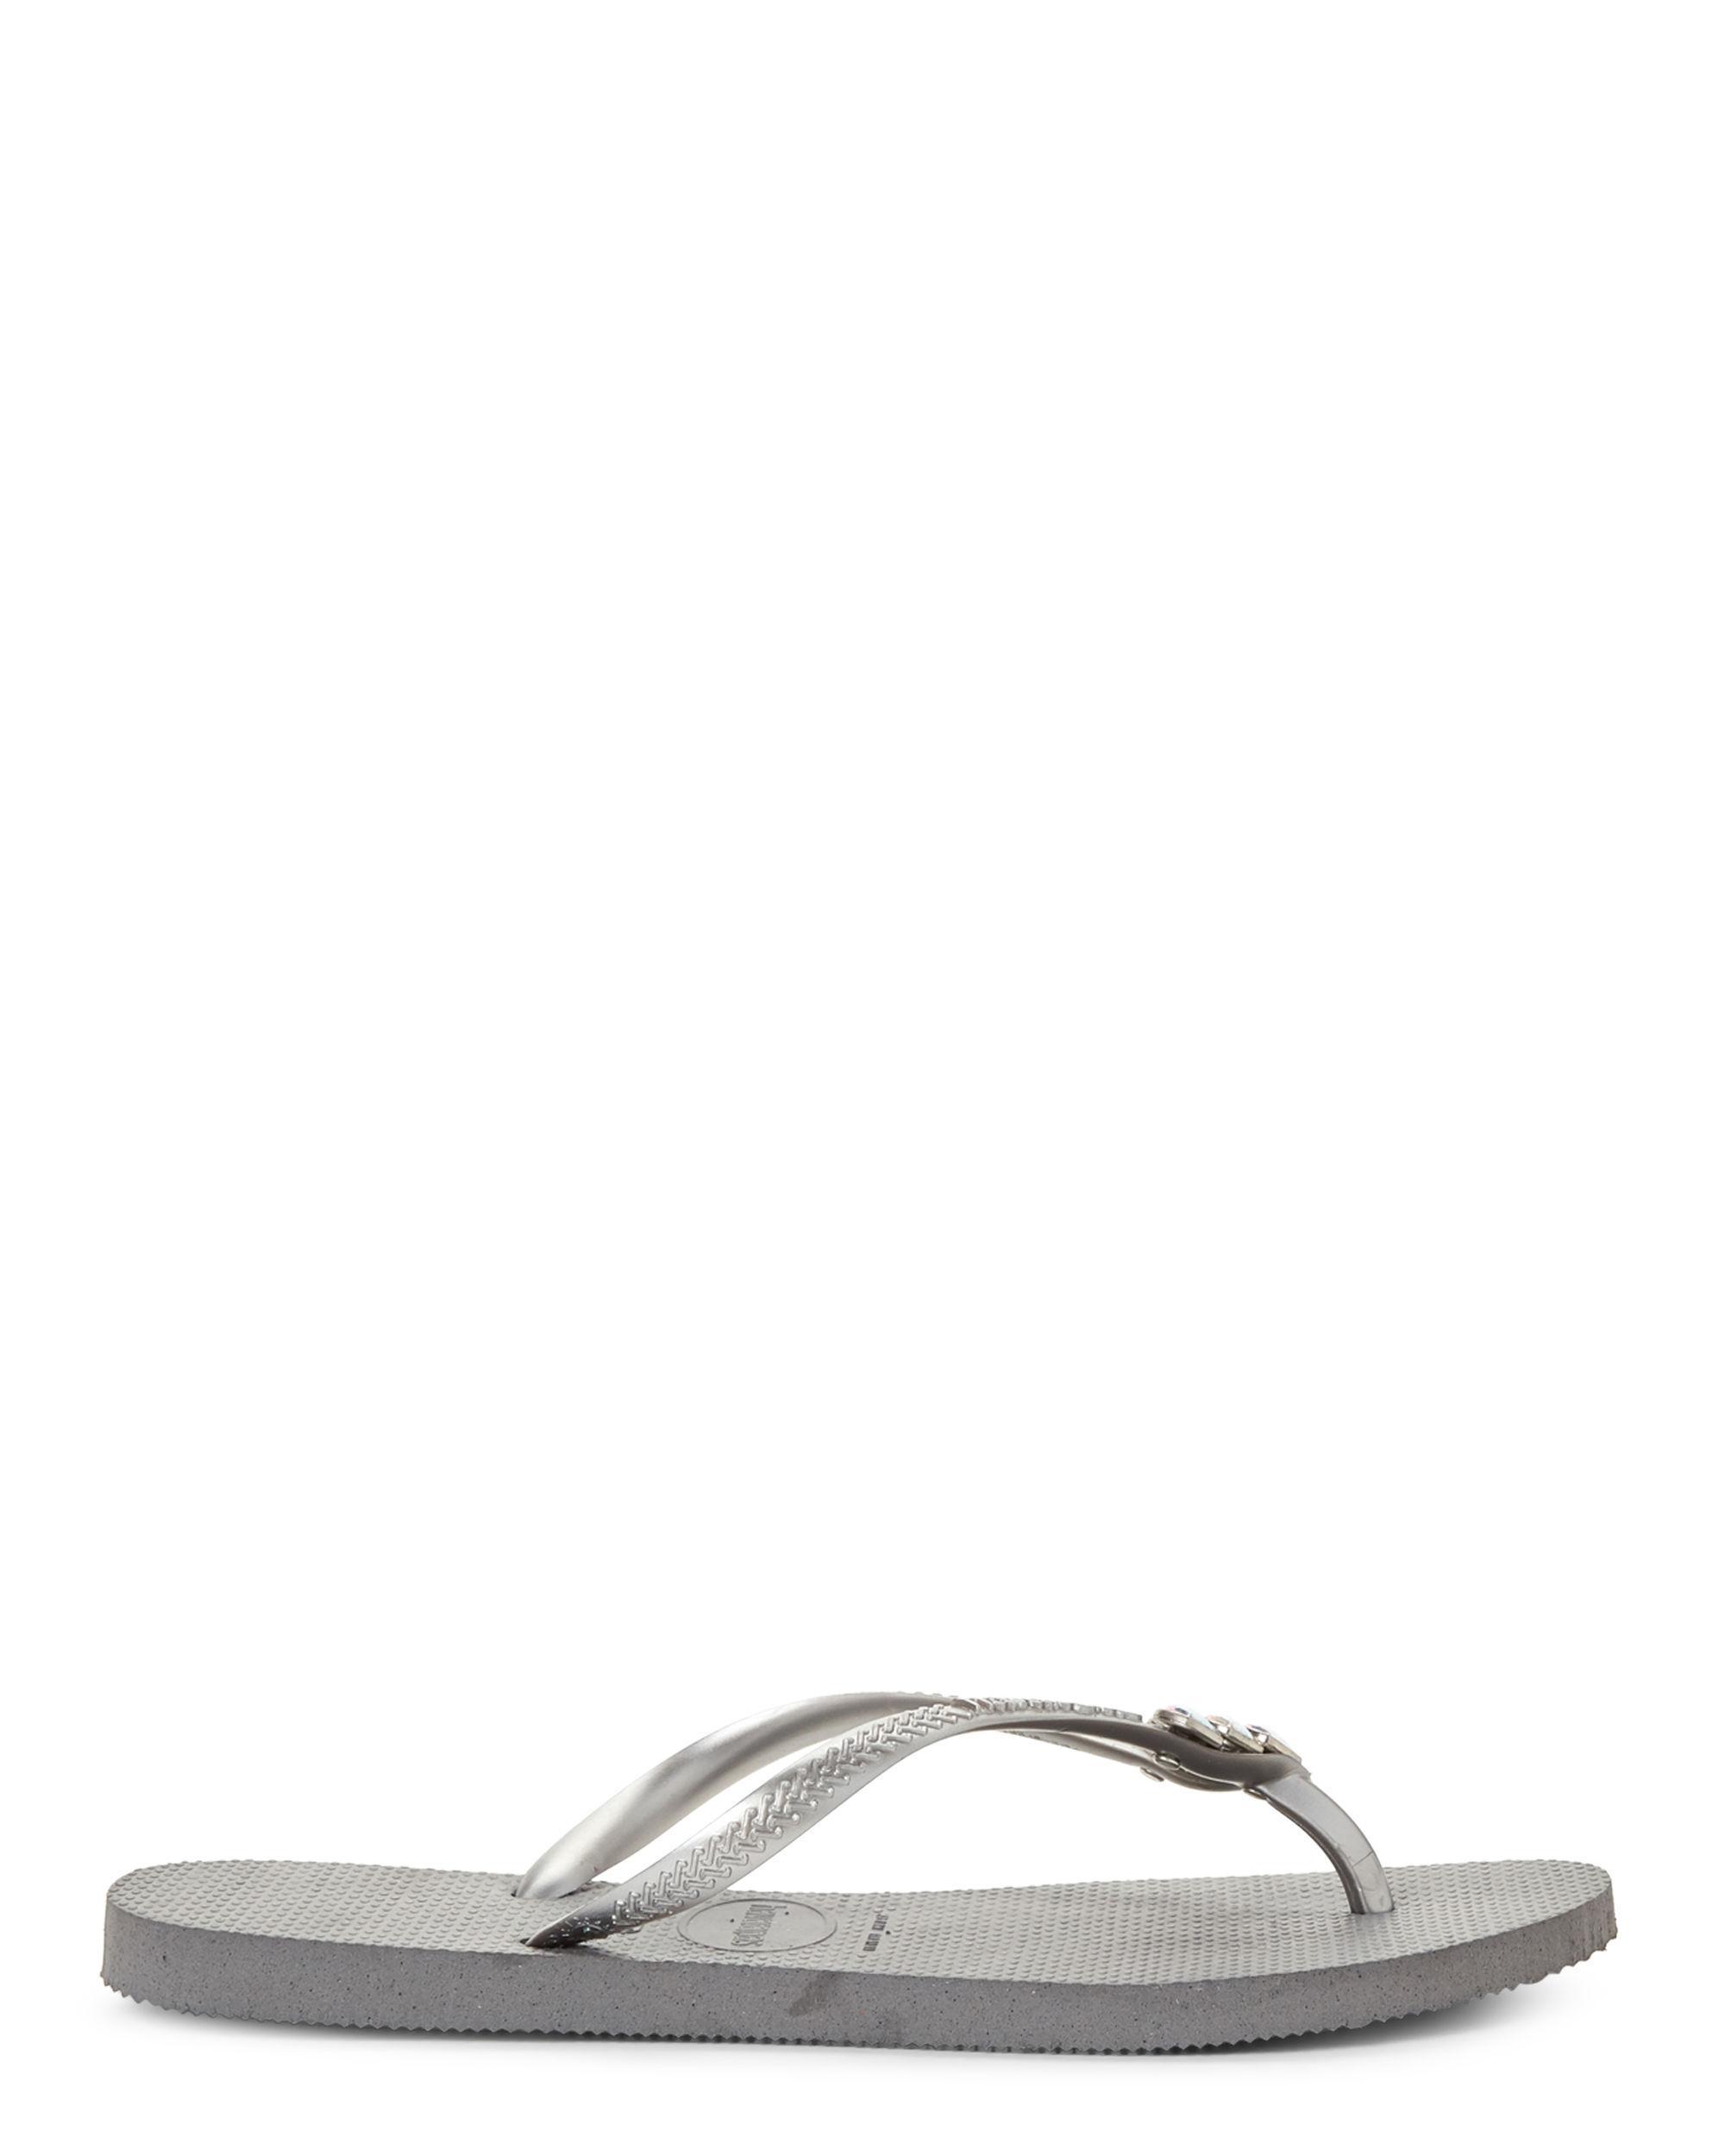 35e2f4821e4 Lyst - Havaianas Steel Grey Slim Mermaid Sandals in Gray